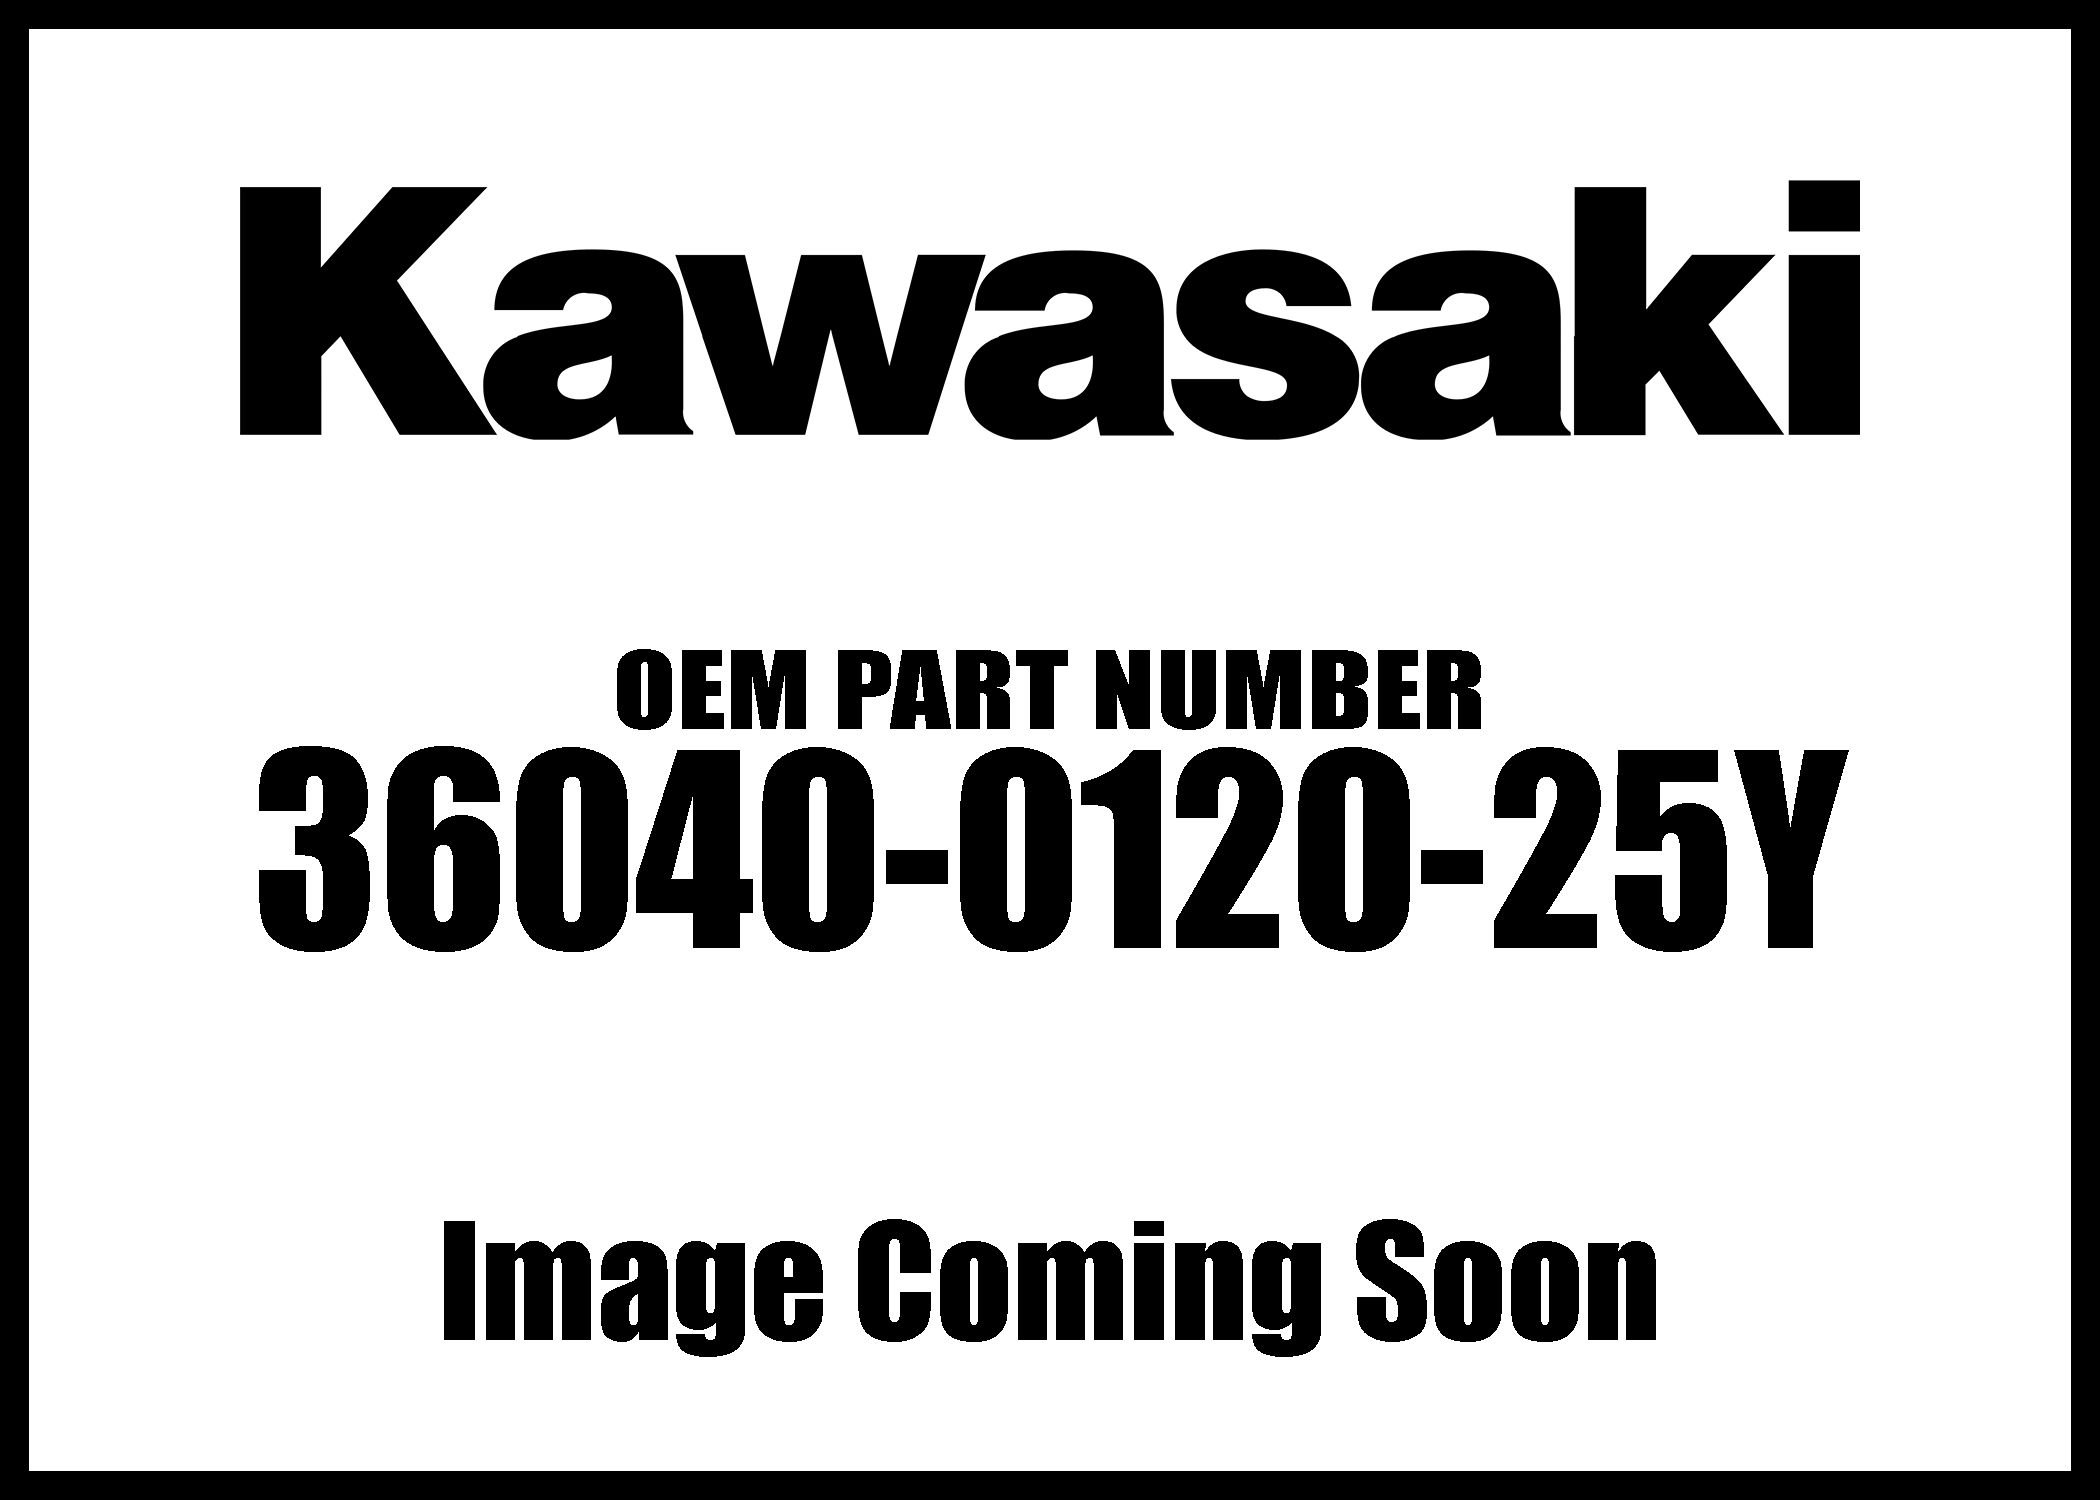 Kawasaki 2013 Ninja 650 Ninja 650 Abs Tail P S Whi Rh Cover 36040-0120-25Y New Oem